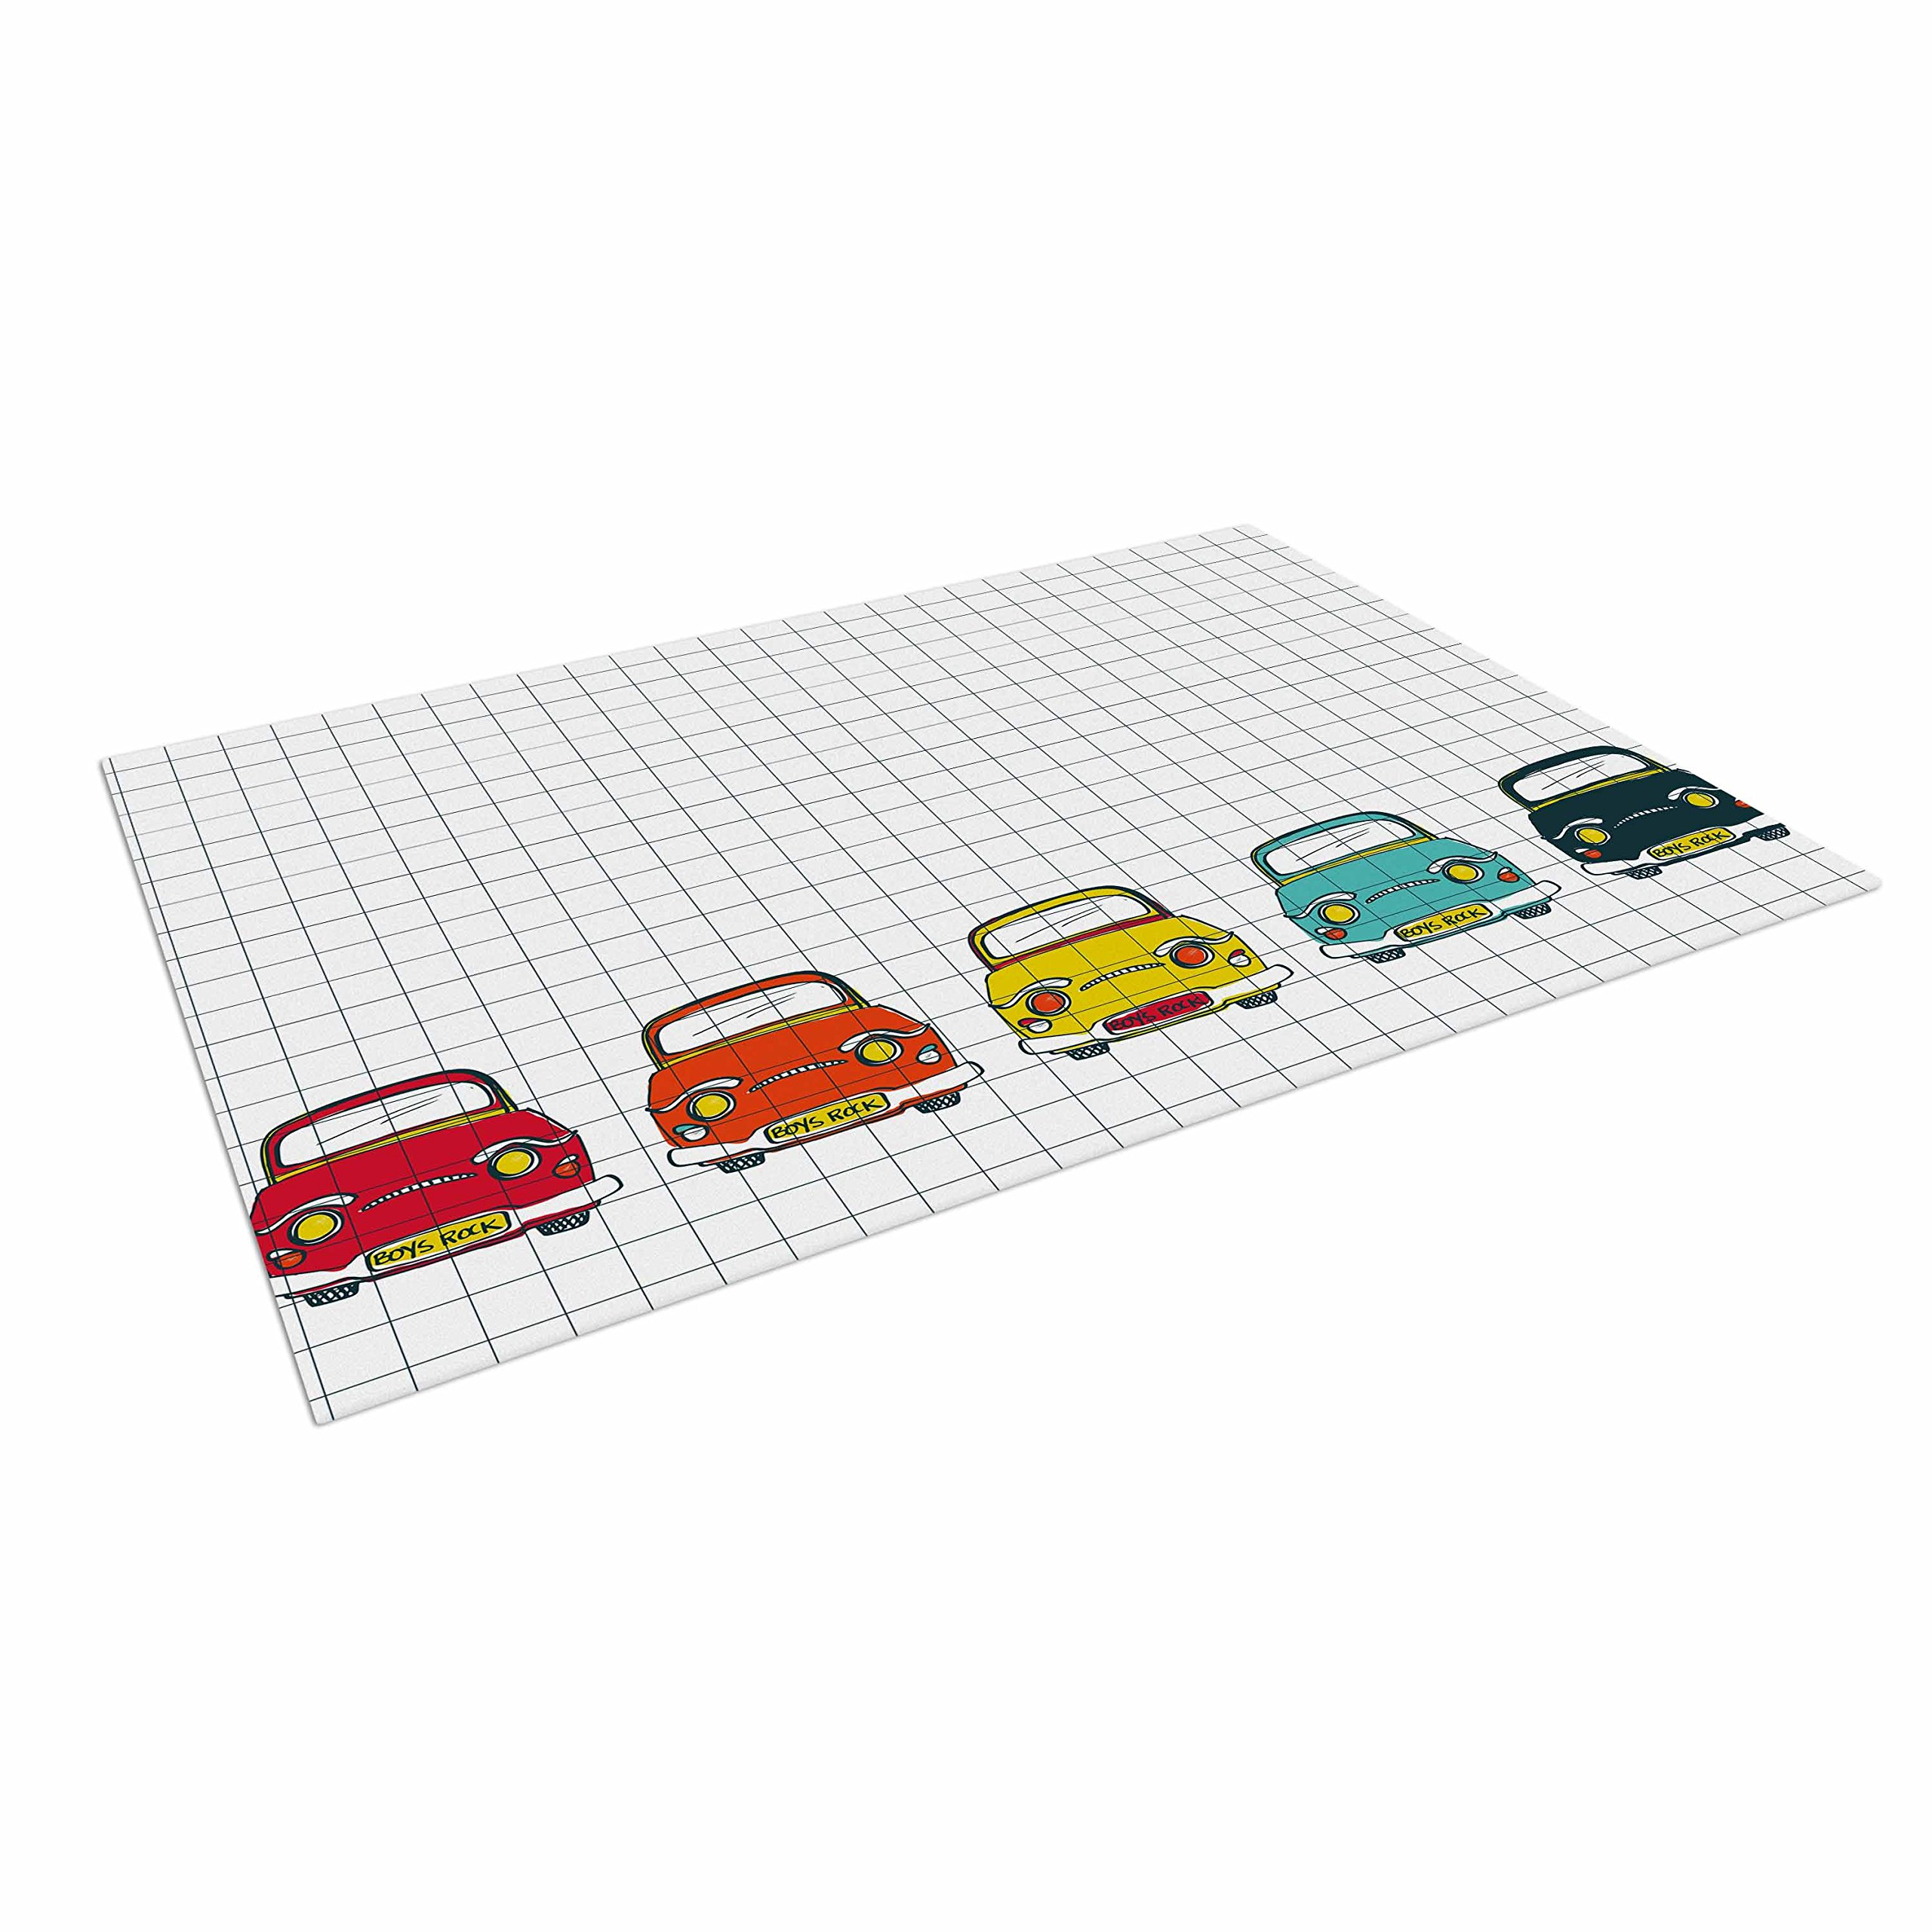 KESS InHouse Majobv ''Boys Rock'' Multicolor Cars Outdoor Floor Mat, 4' x 5'